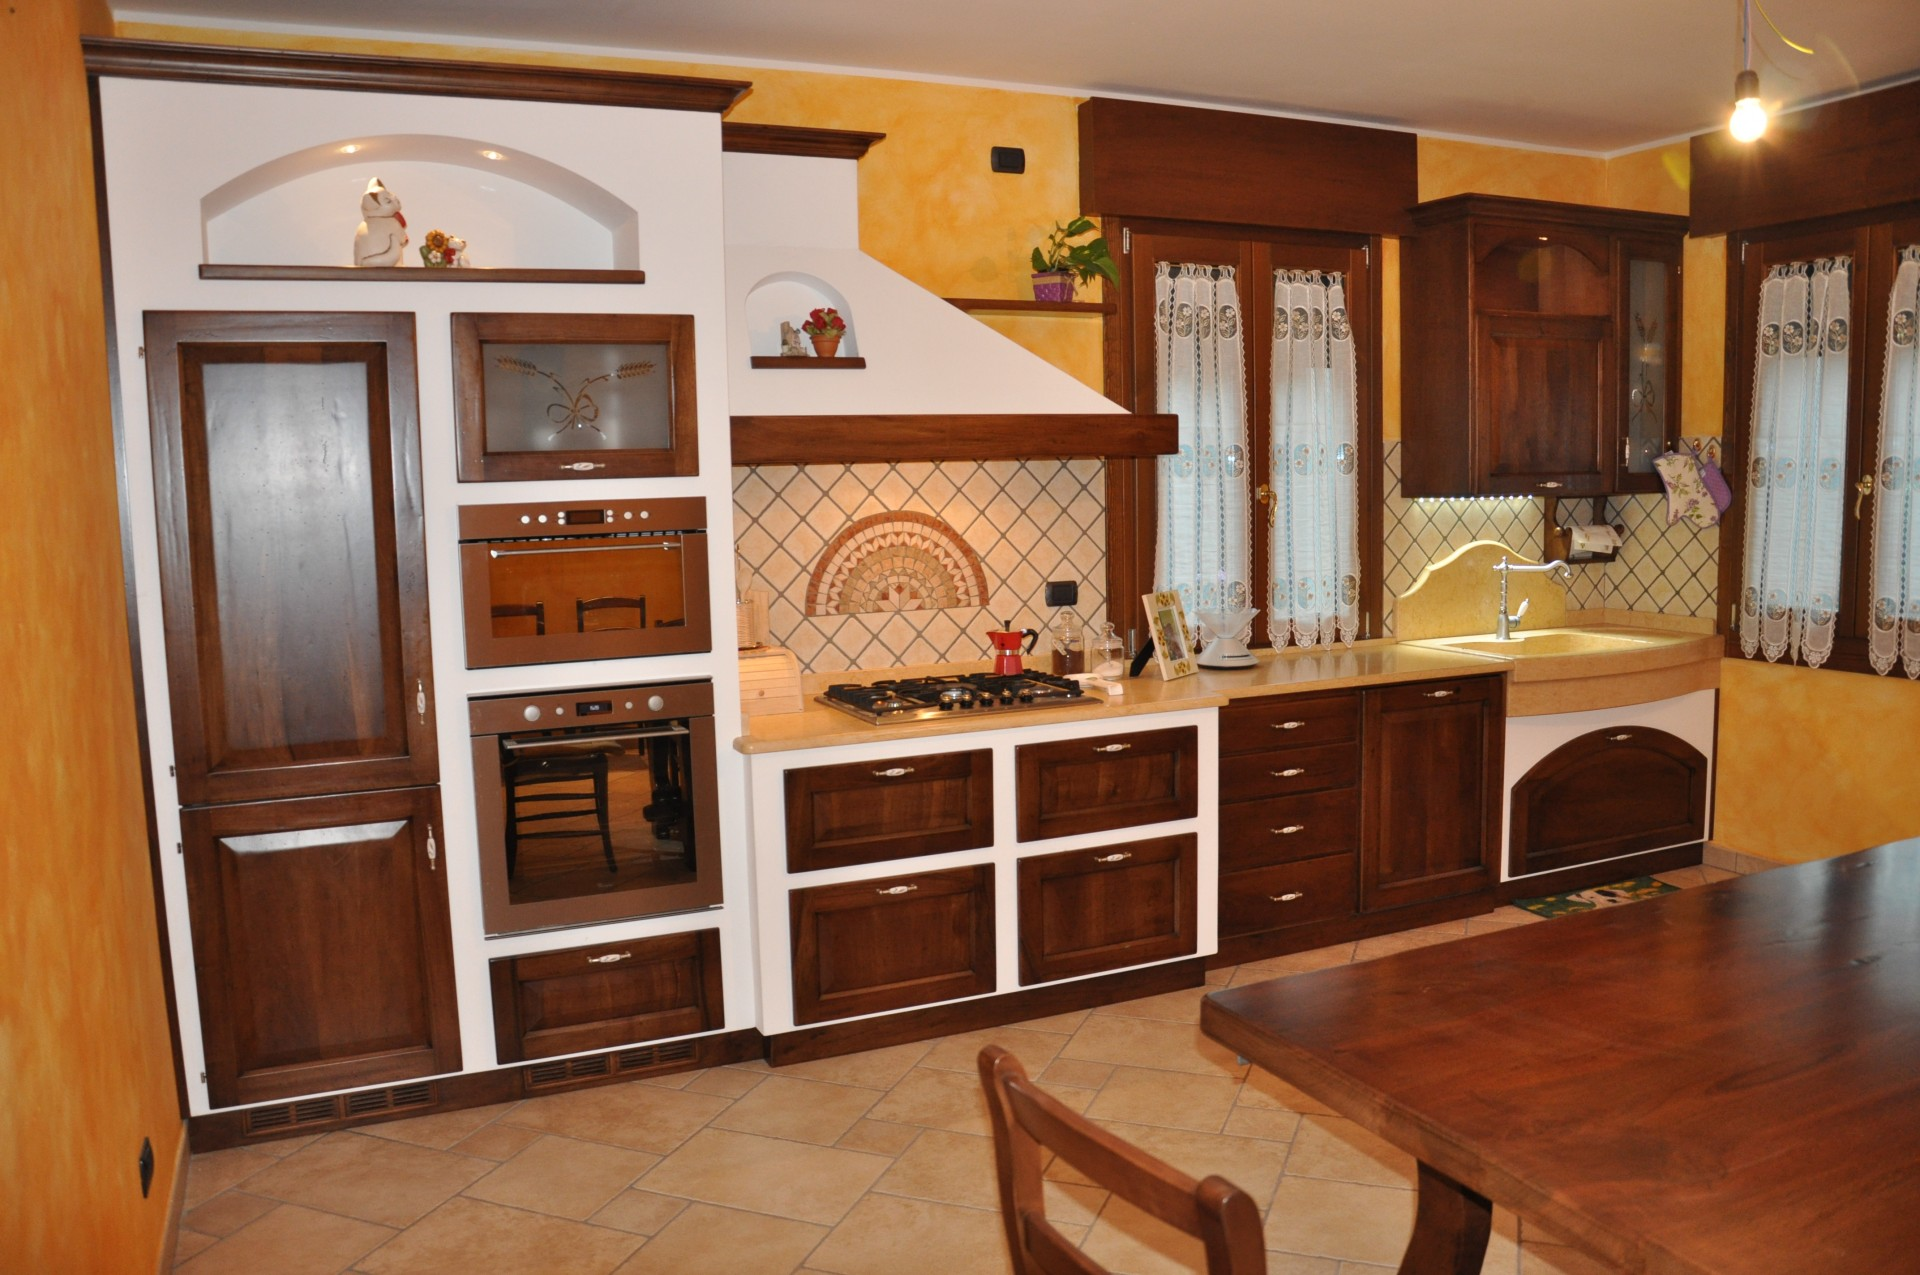 Cucina in muratura fadini mobili cerea verona - Cucine country in muratura ...